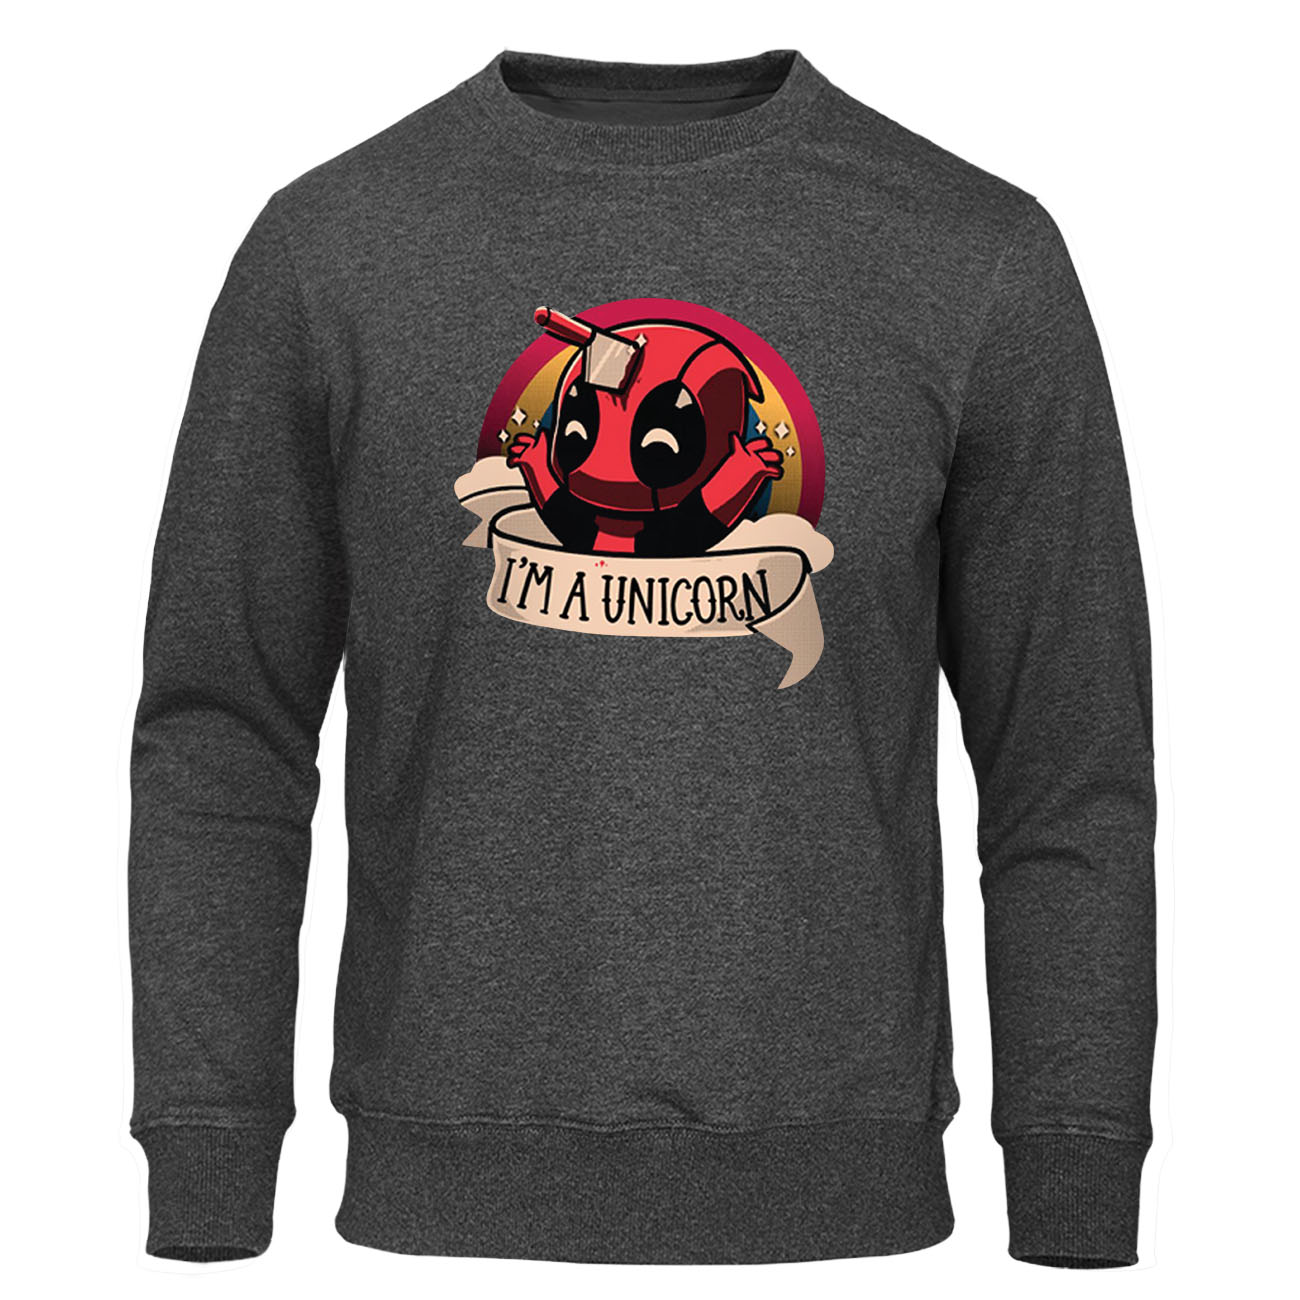 2019 Winter Autumn Hoodies Casual Funny Deadpool Sweatshirt Hop Hip Mens Pullover Fleece Men Clothes Harajuku Streetwear Hoody